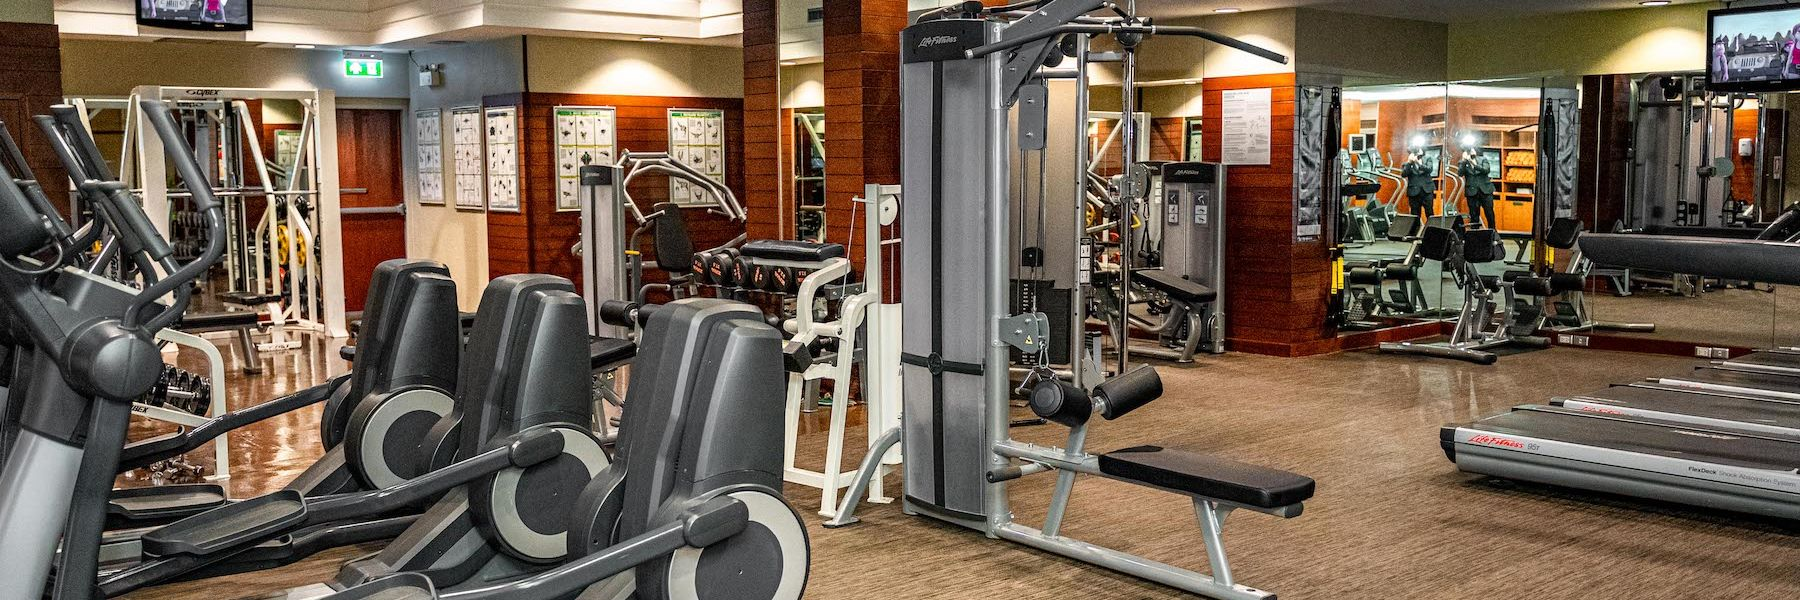 Westin Workout Fitness Studio image